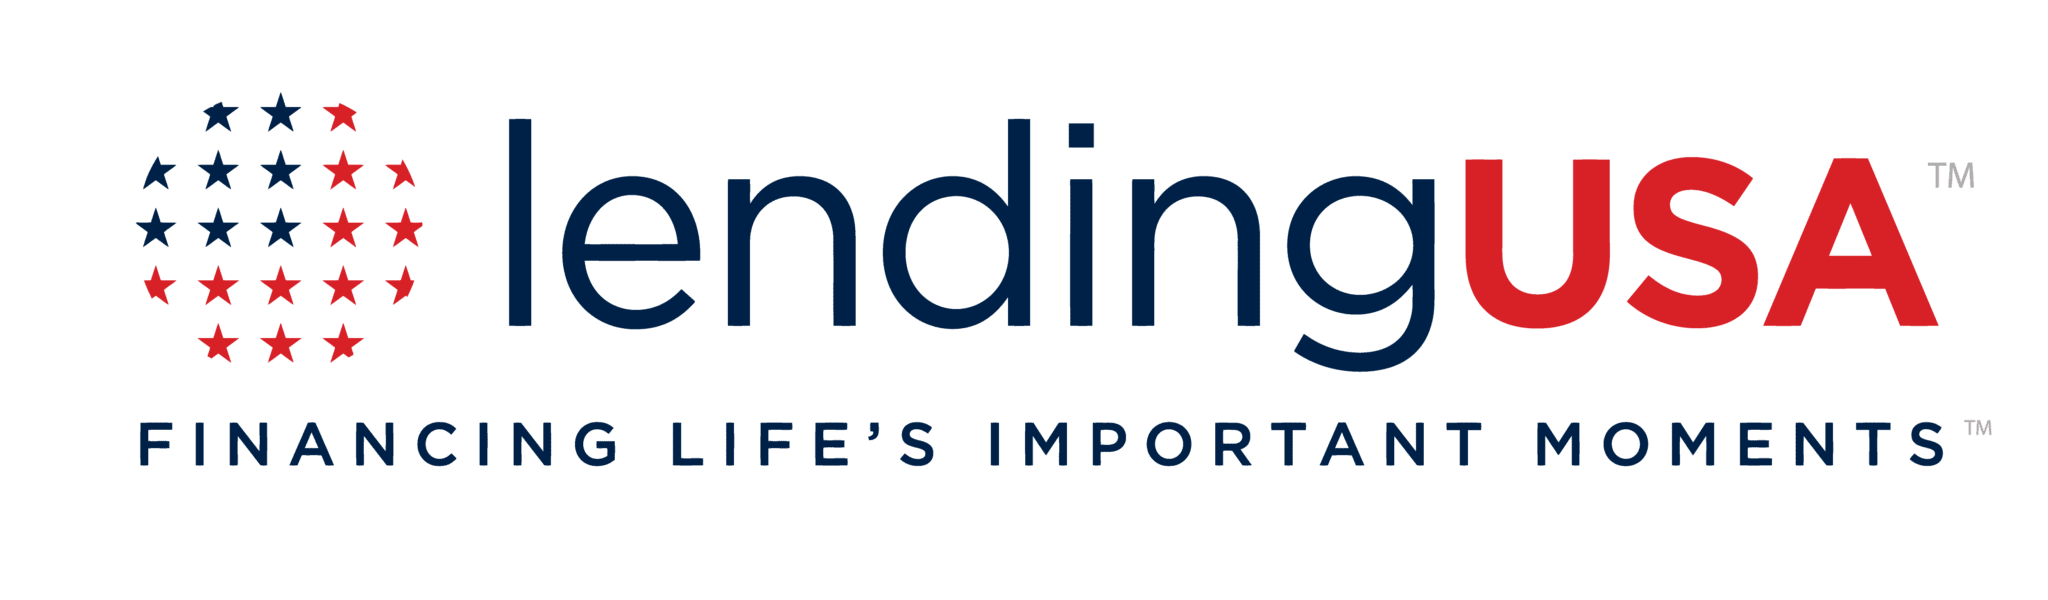 financing plastic surgery, Financing